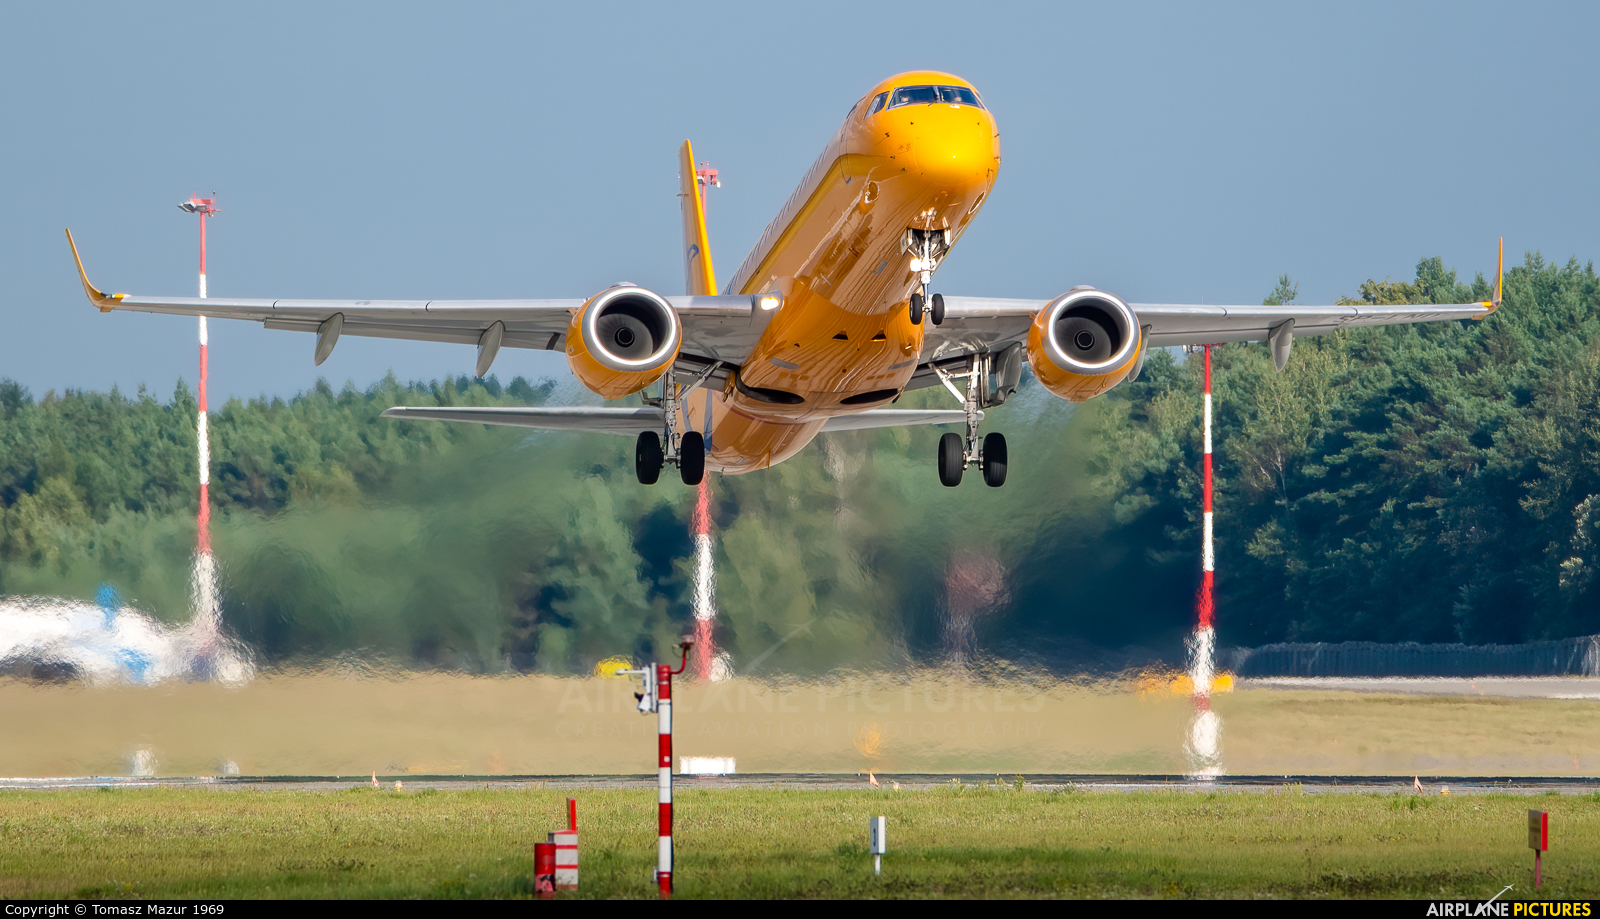 LOT - Polish Airlines SP-LNO aircraft at Katowice - Pyrzowice